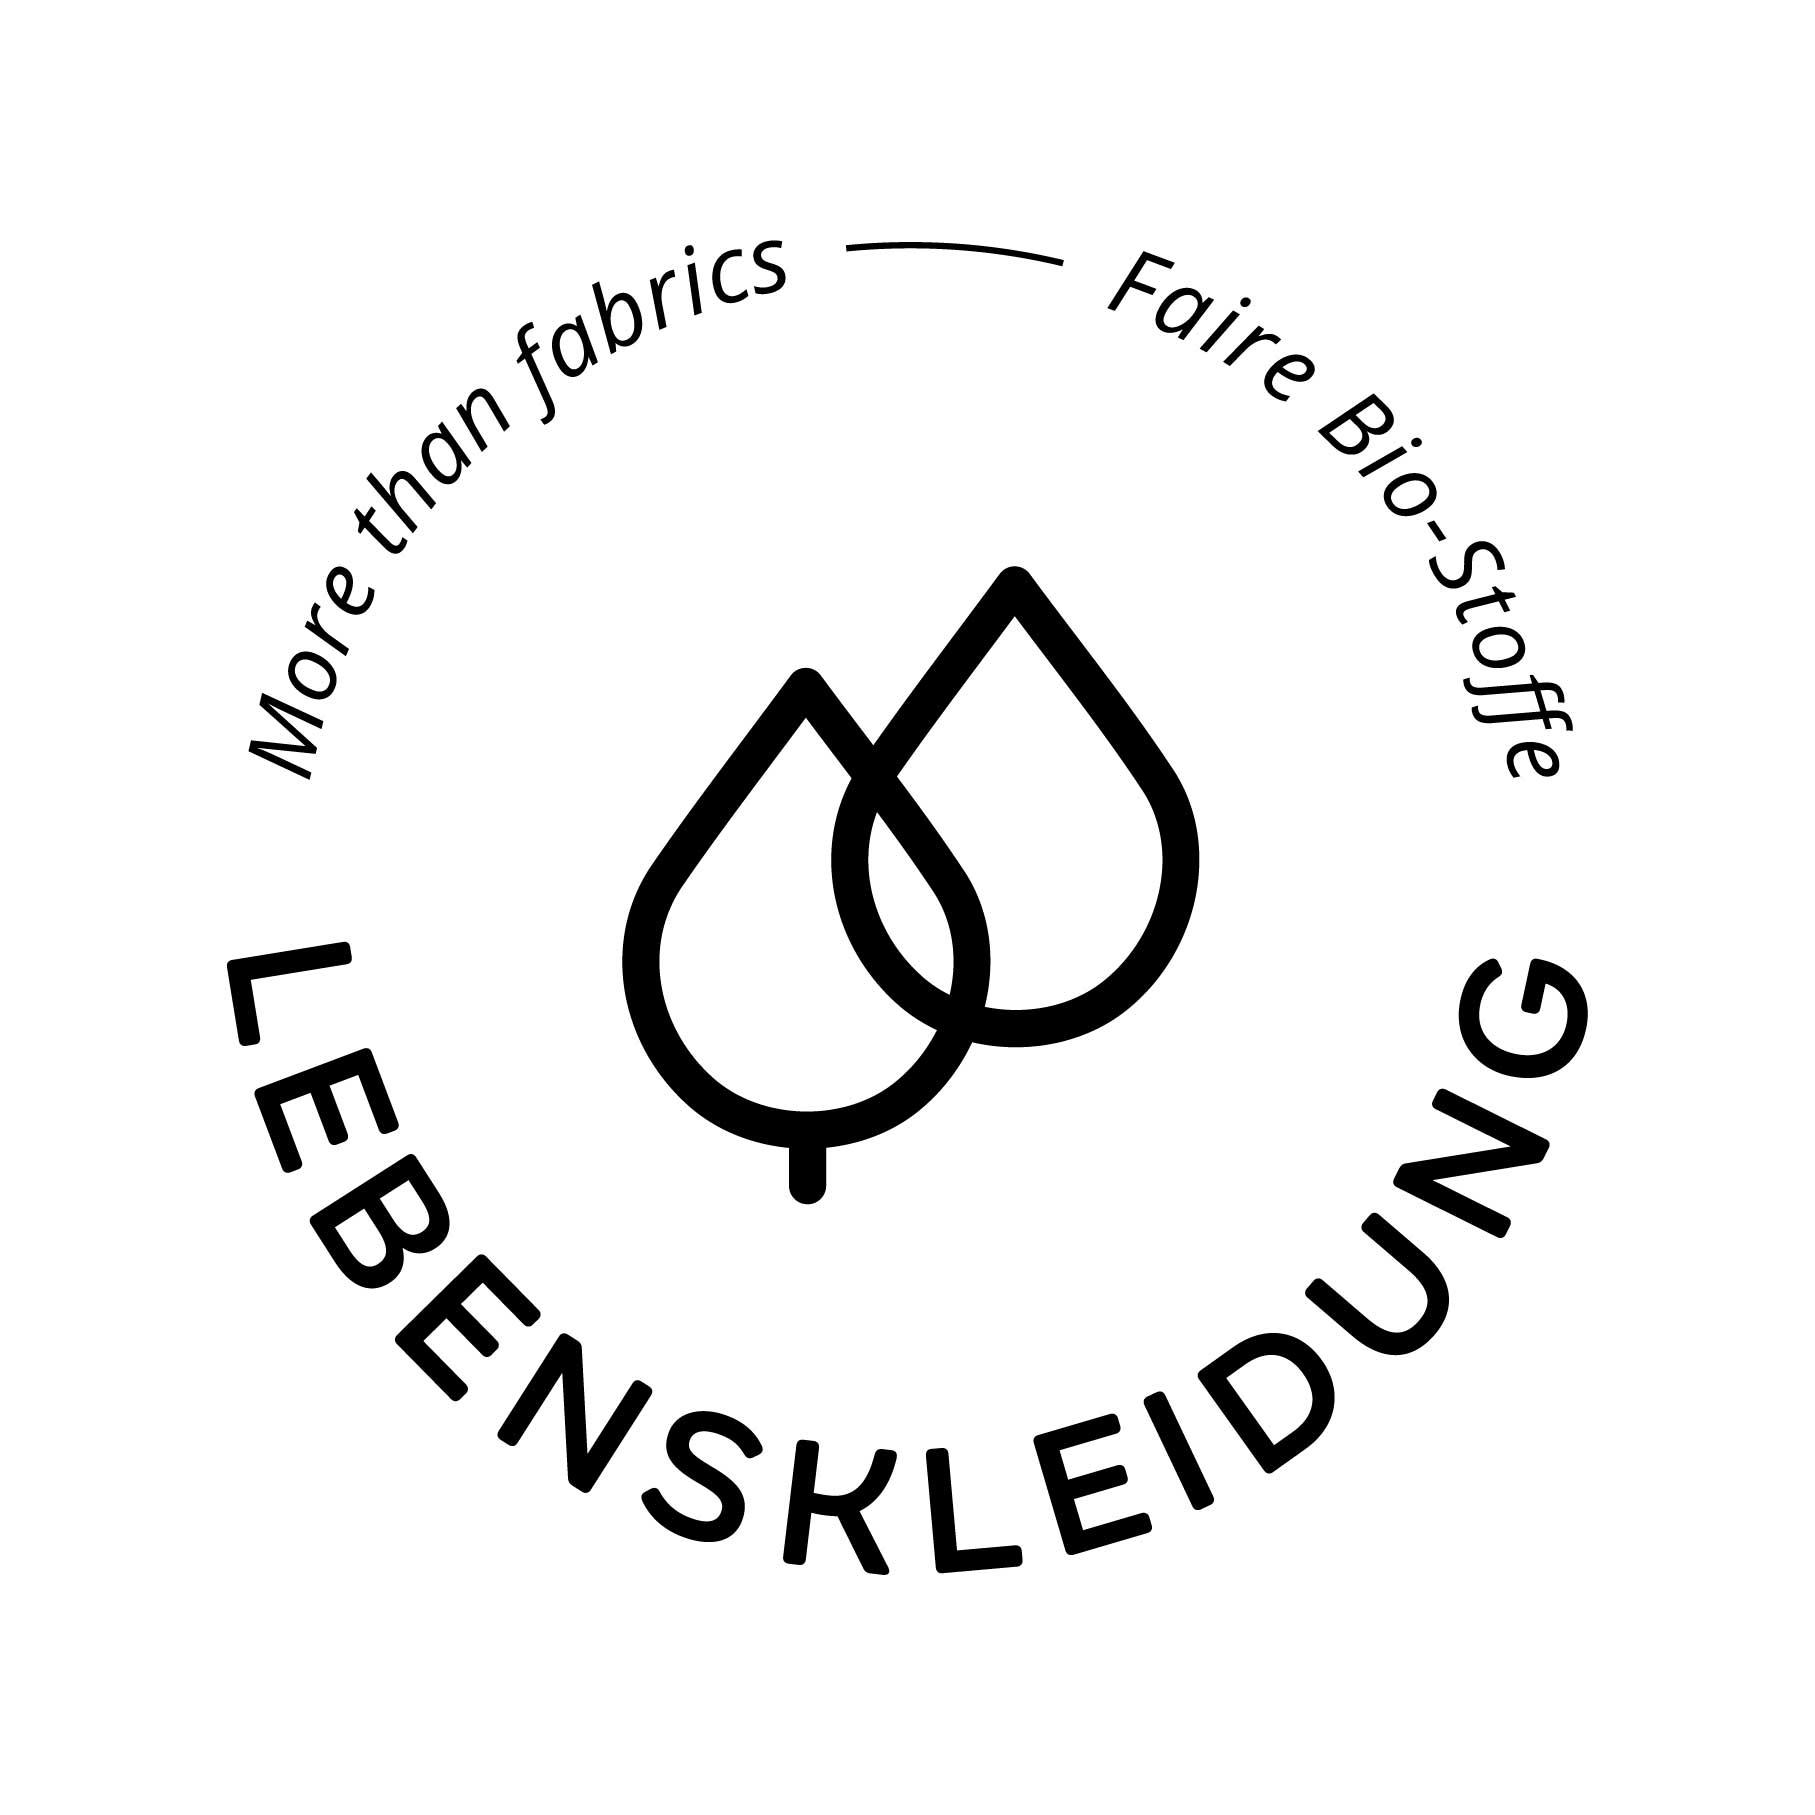 Organic RIB 2x1 (Cuff fabric) - Henna-1